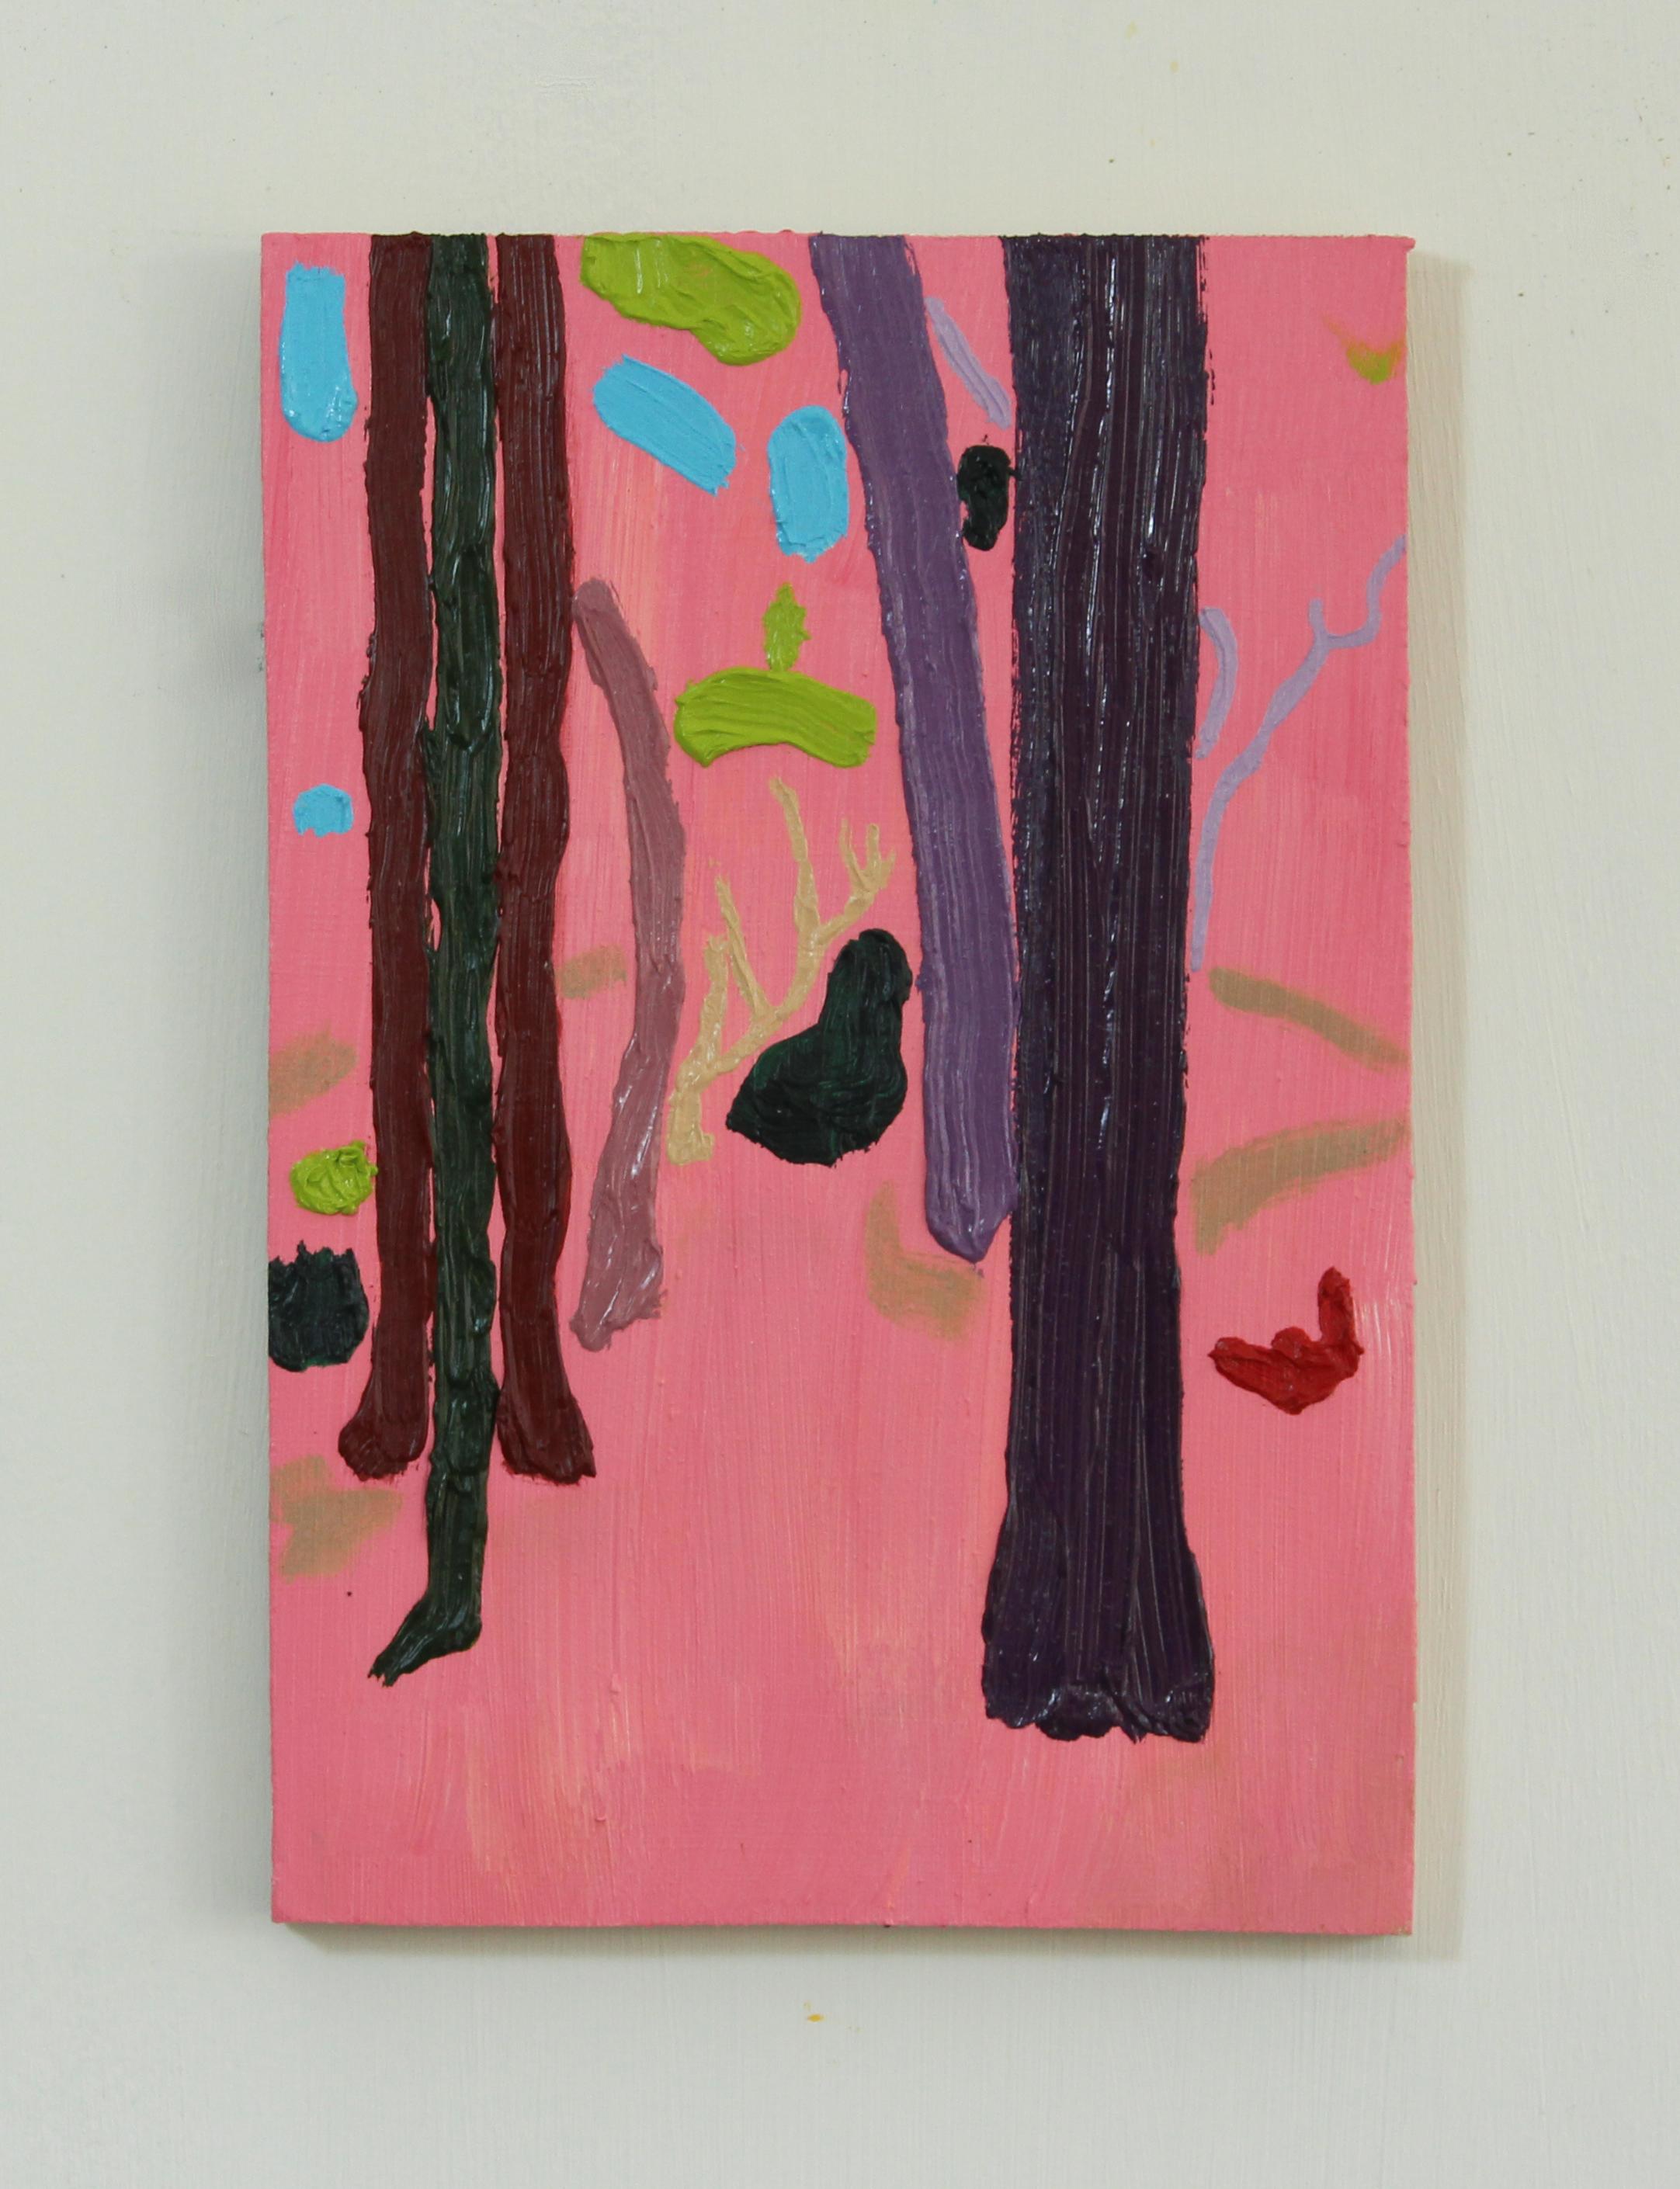 Blakes Wood 5